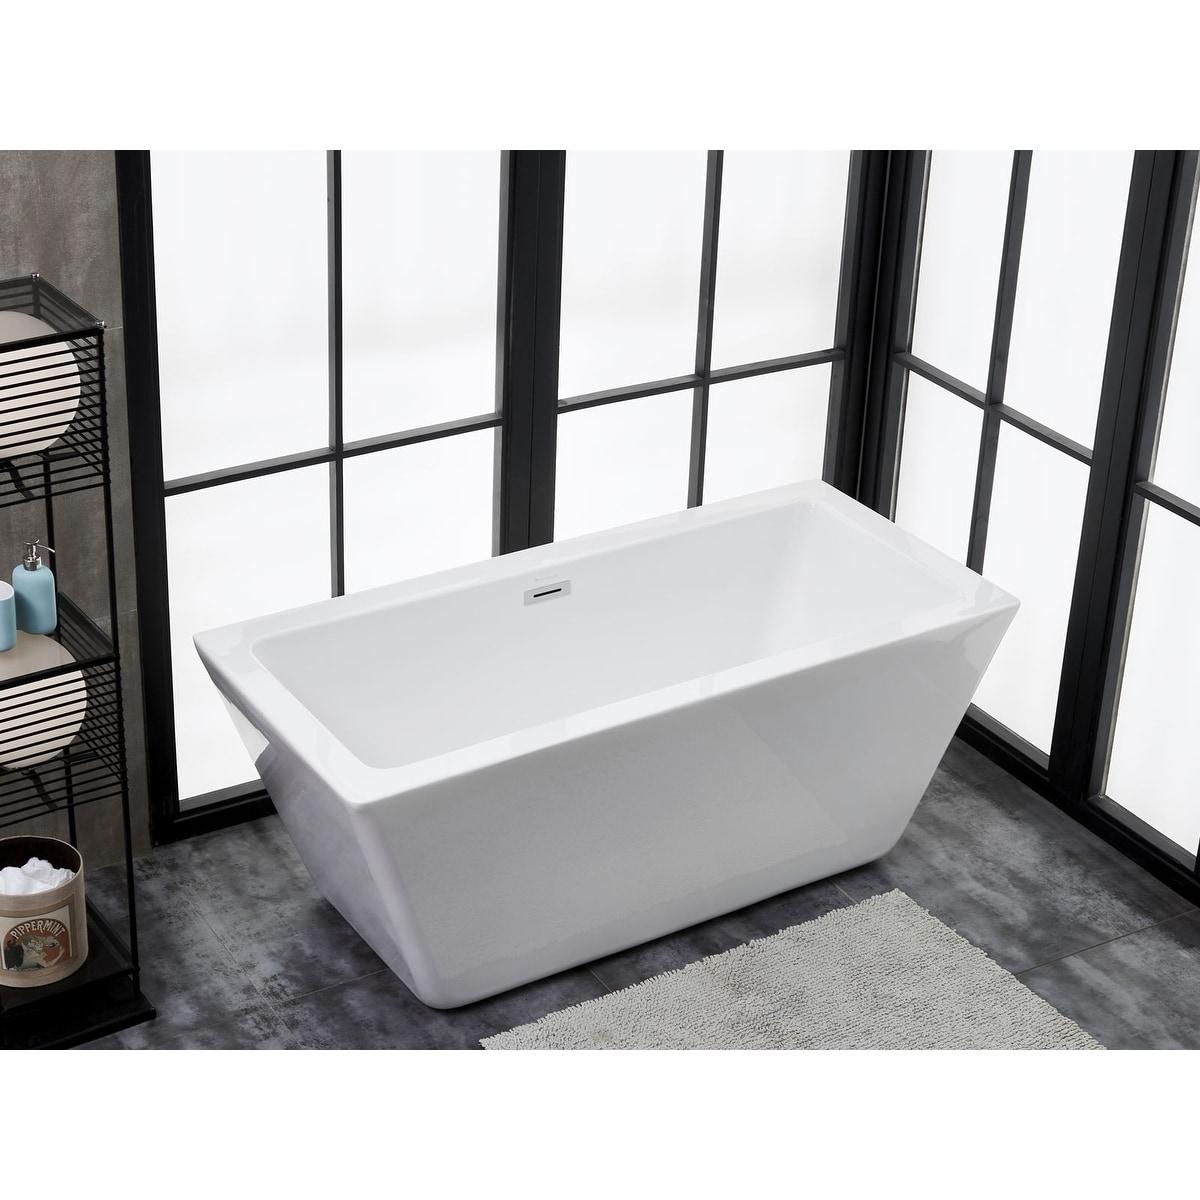 Shop Ravenna 60 X 28 Freestanding Acrylic Soaking Bathtub By